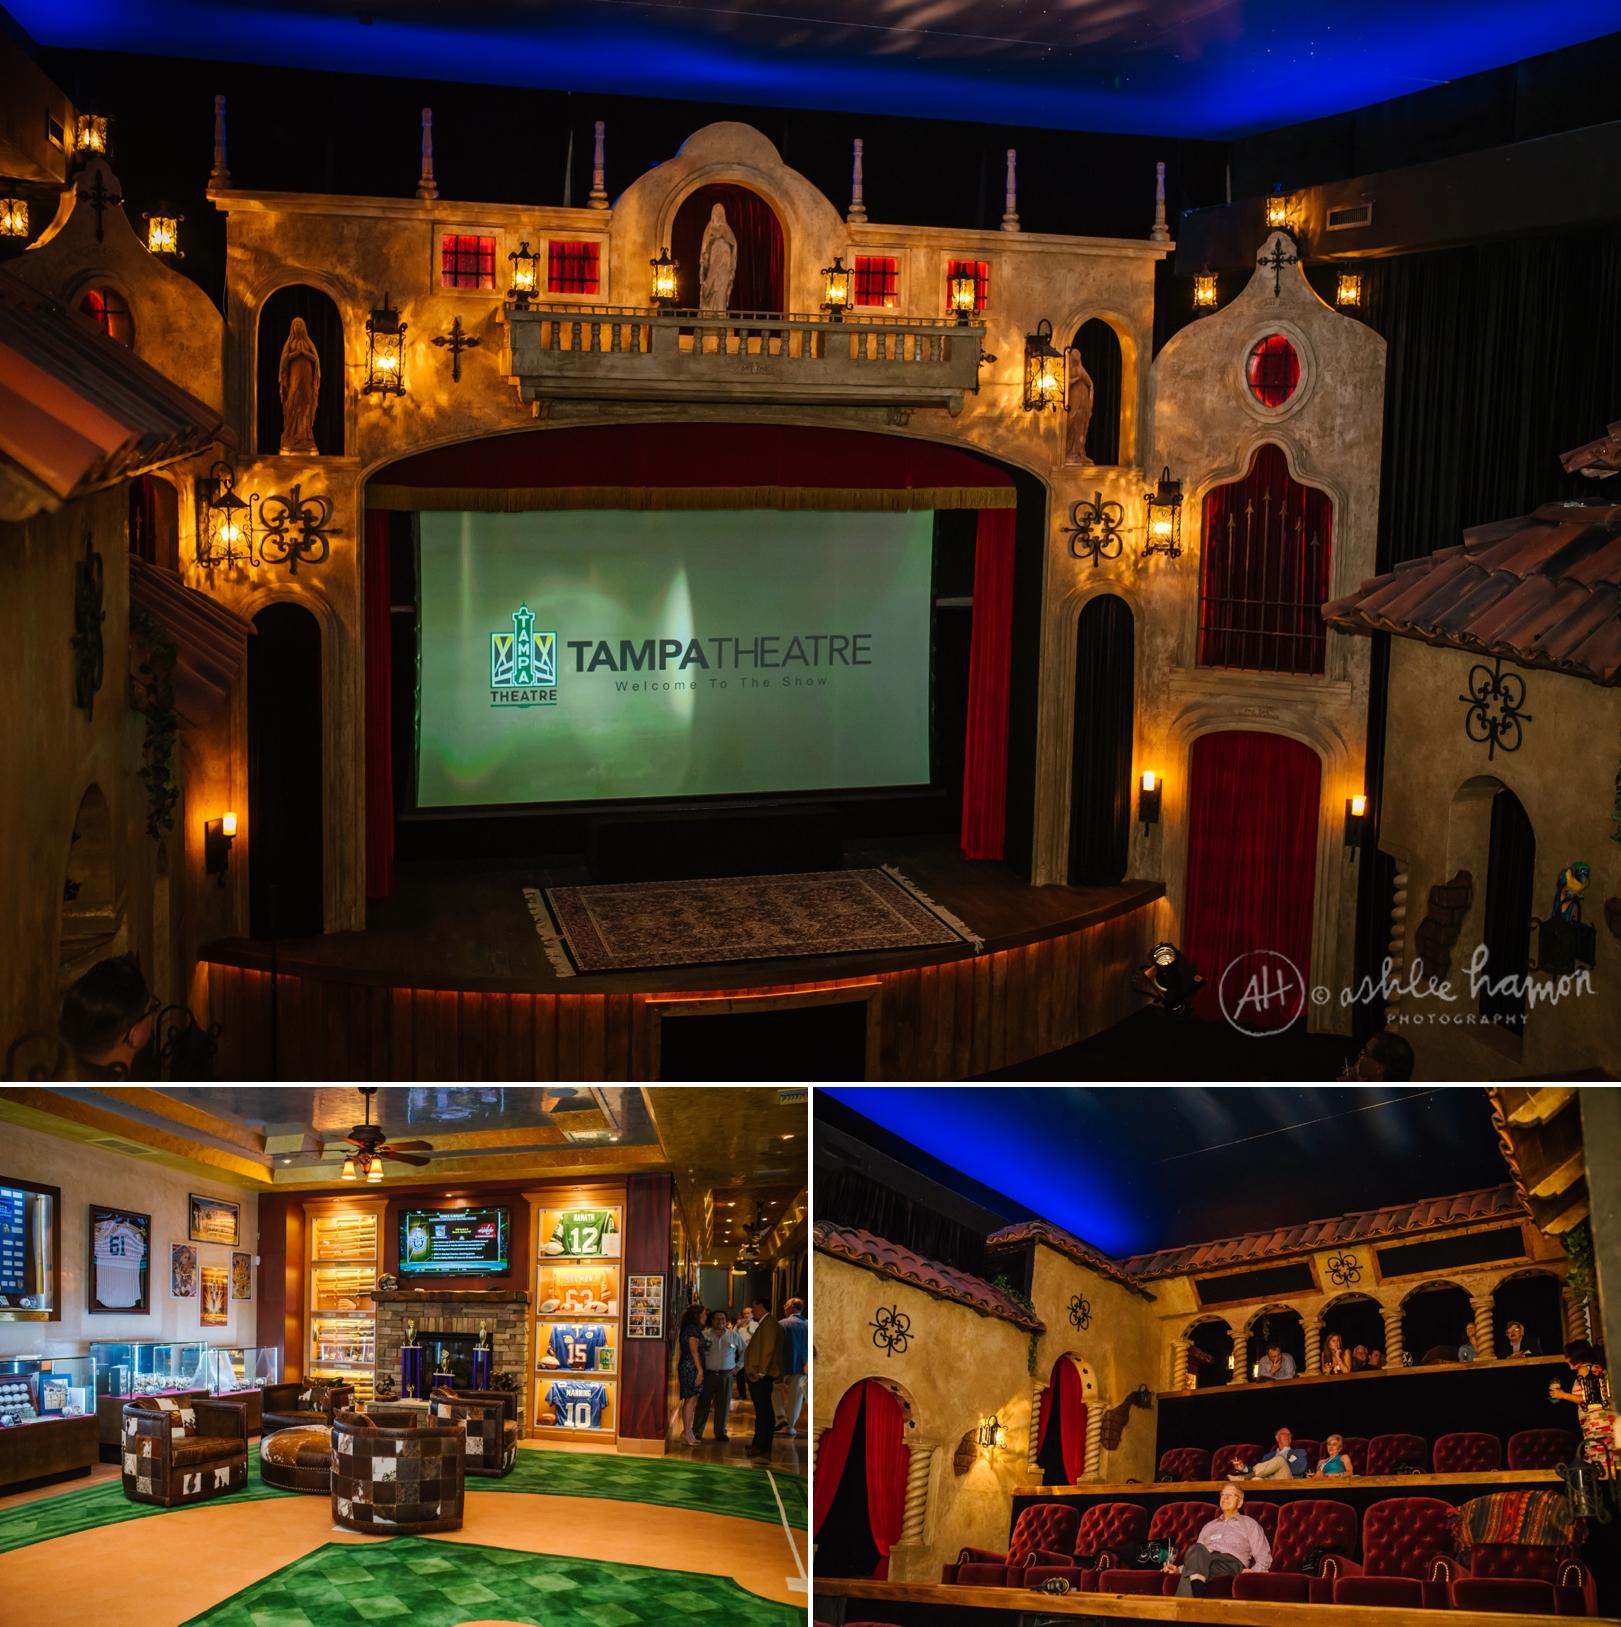 ashlee-hamon-event-photographer-tampa-theatre_0006.jpg